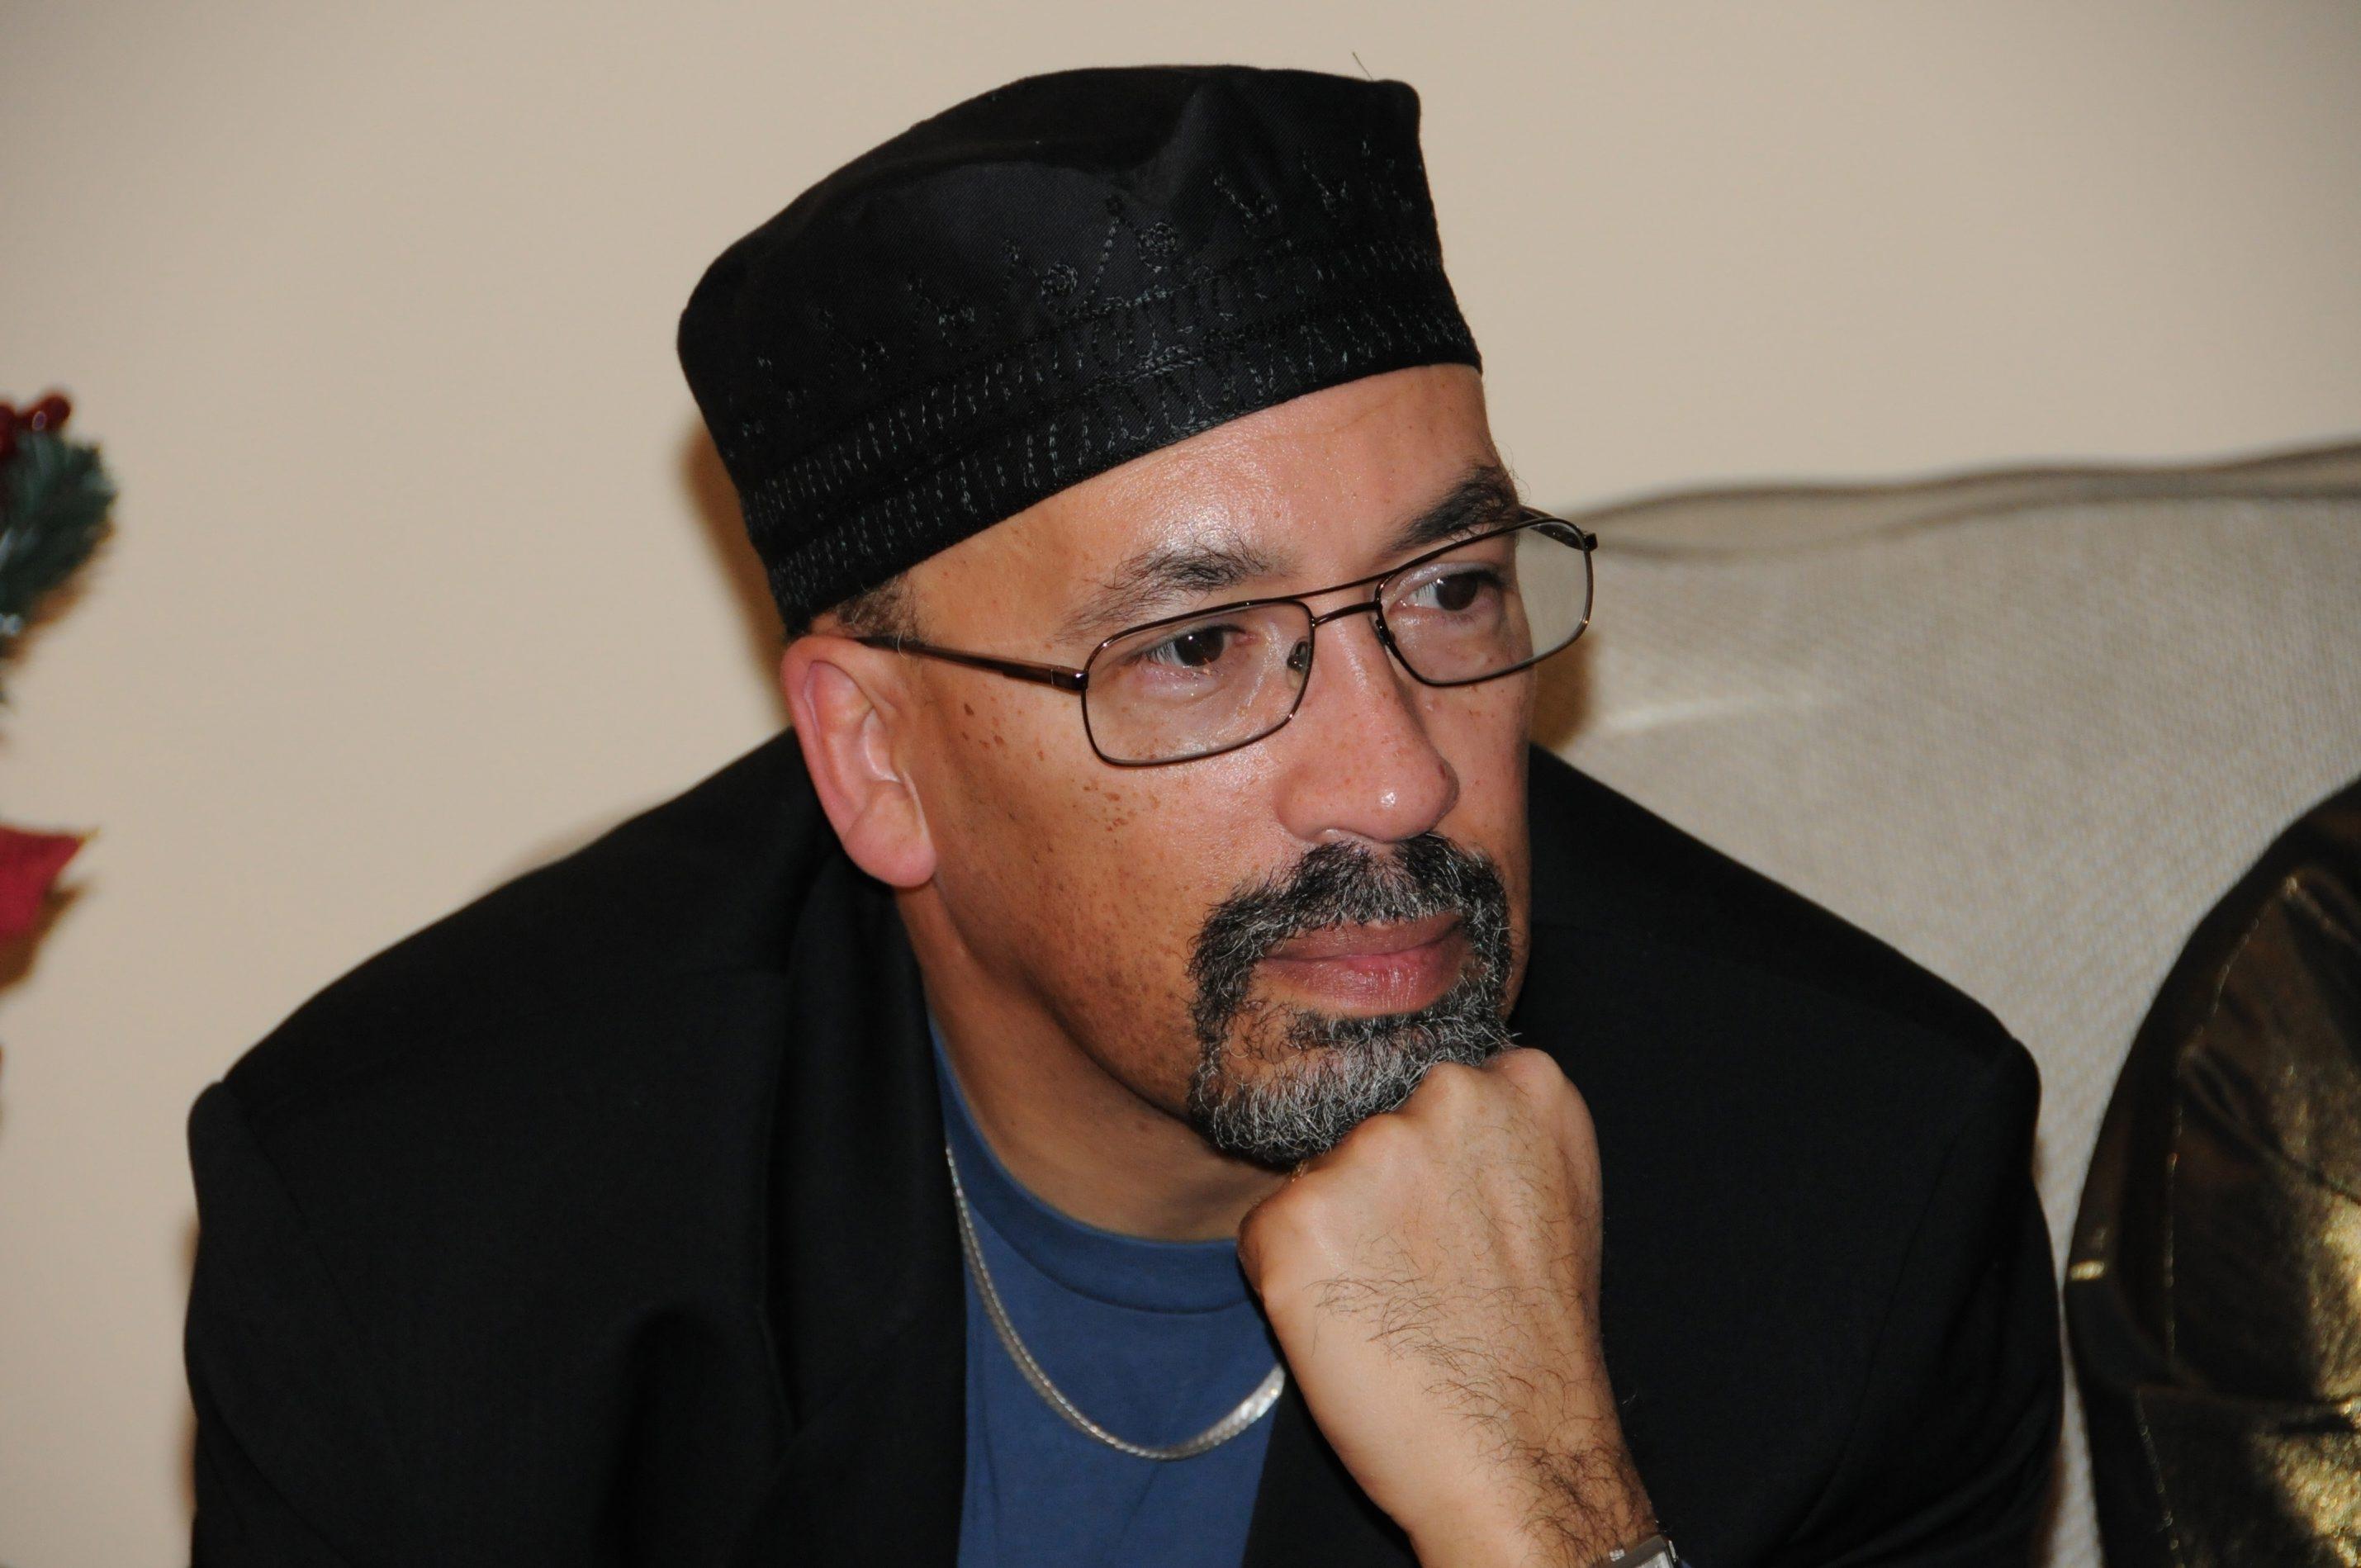 Union activist Bill Fletcher Jr. (Contributed photo)